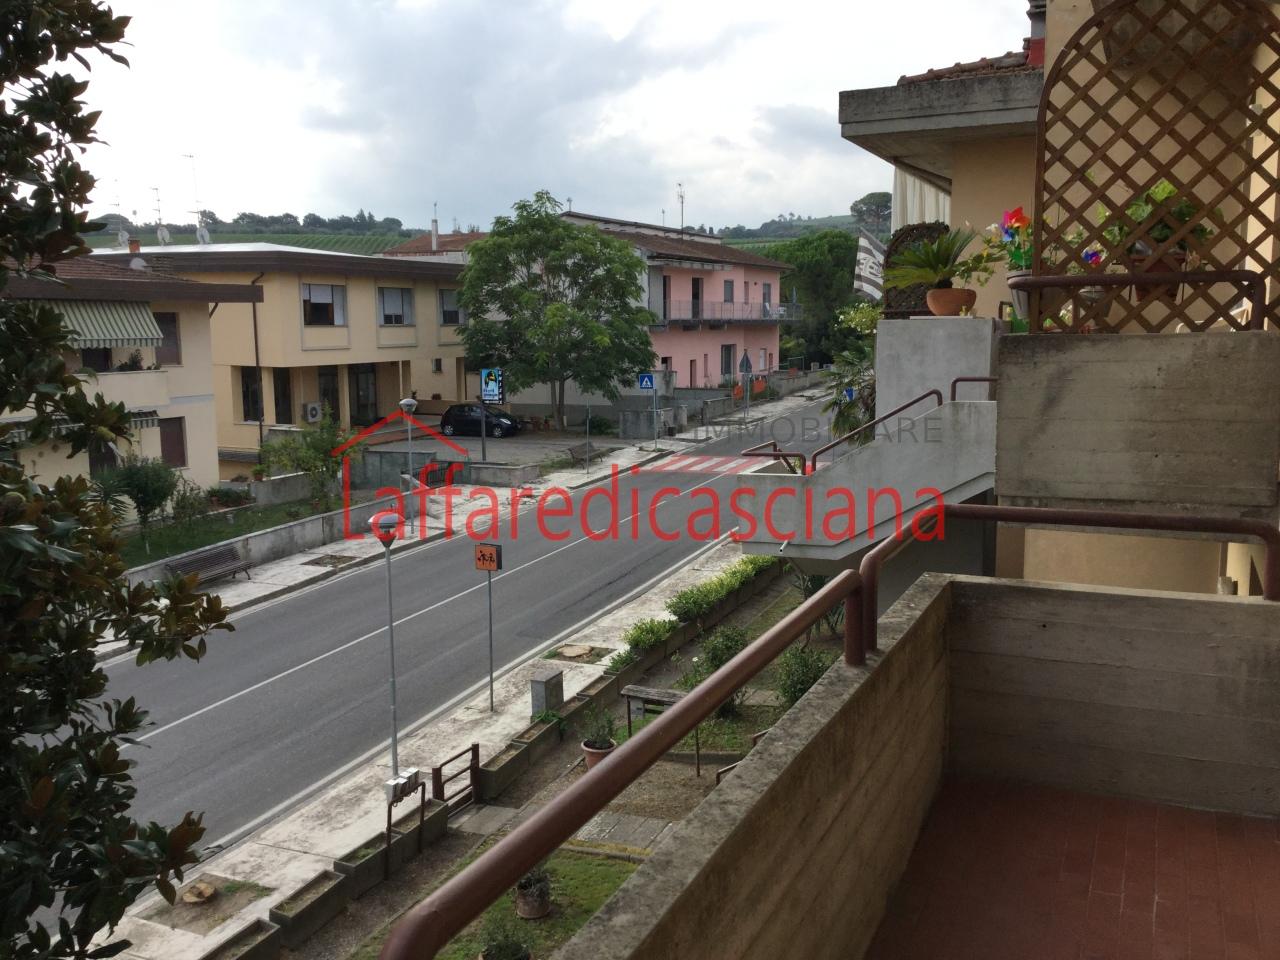 Appartamento in vendita - Casciana Terme, Casciana Terme Lari